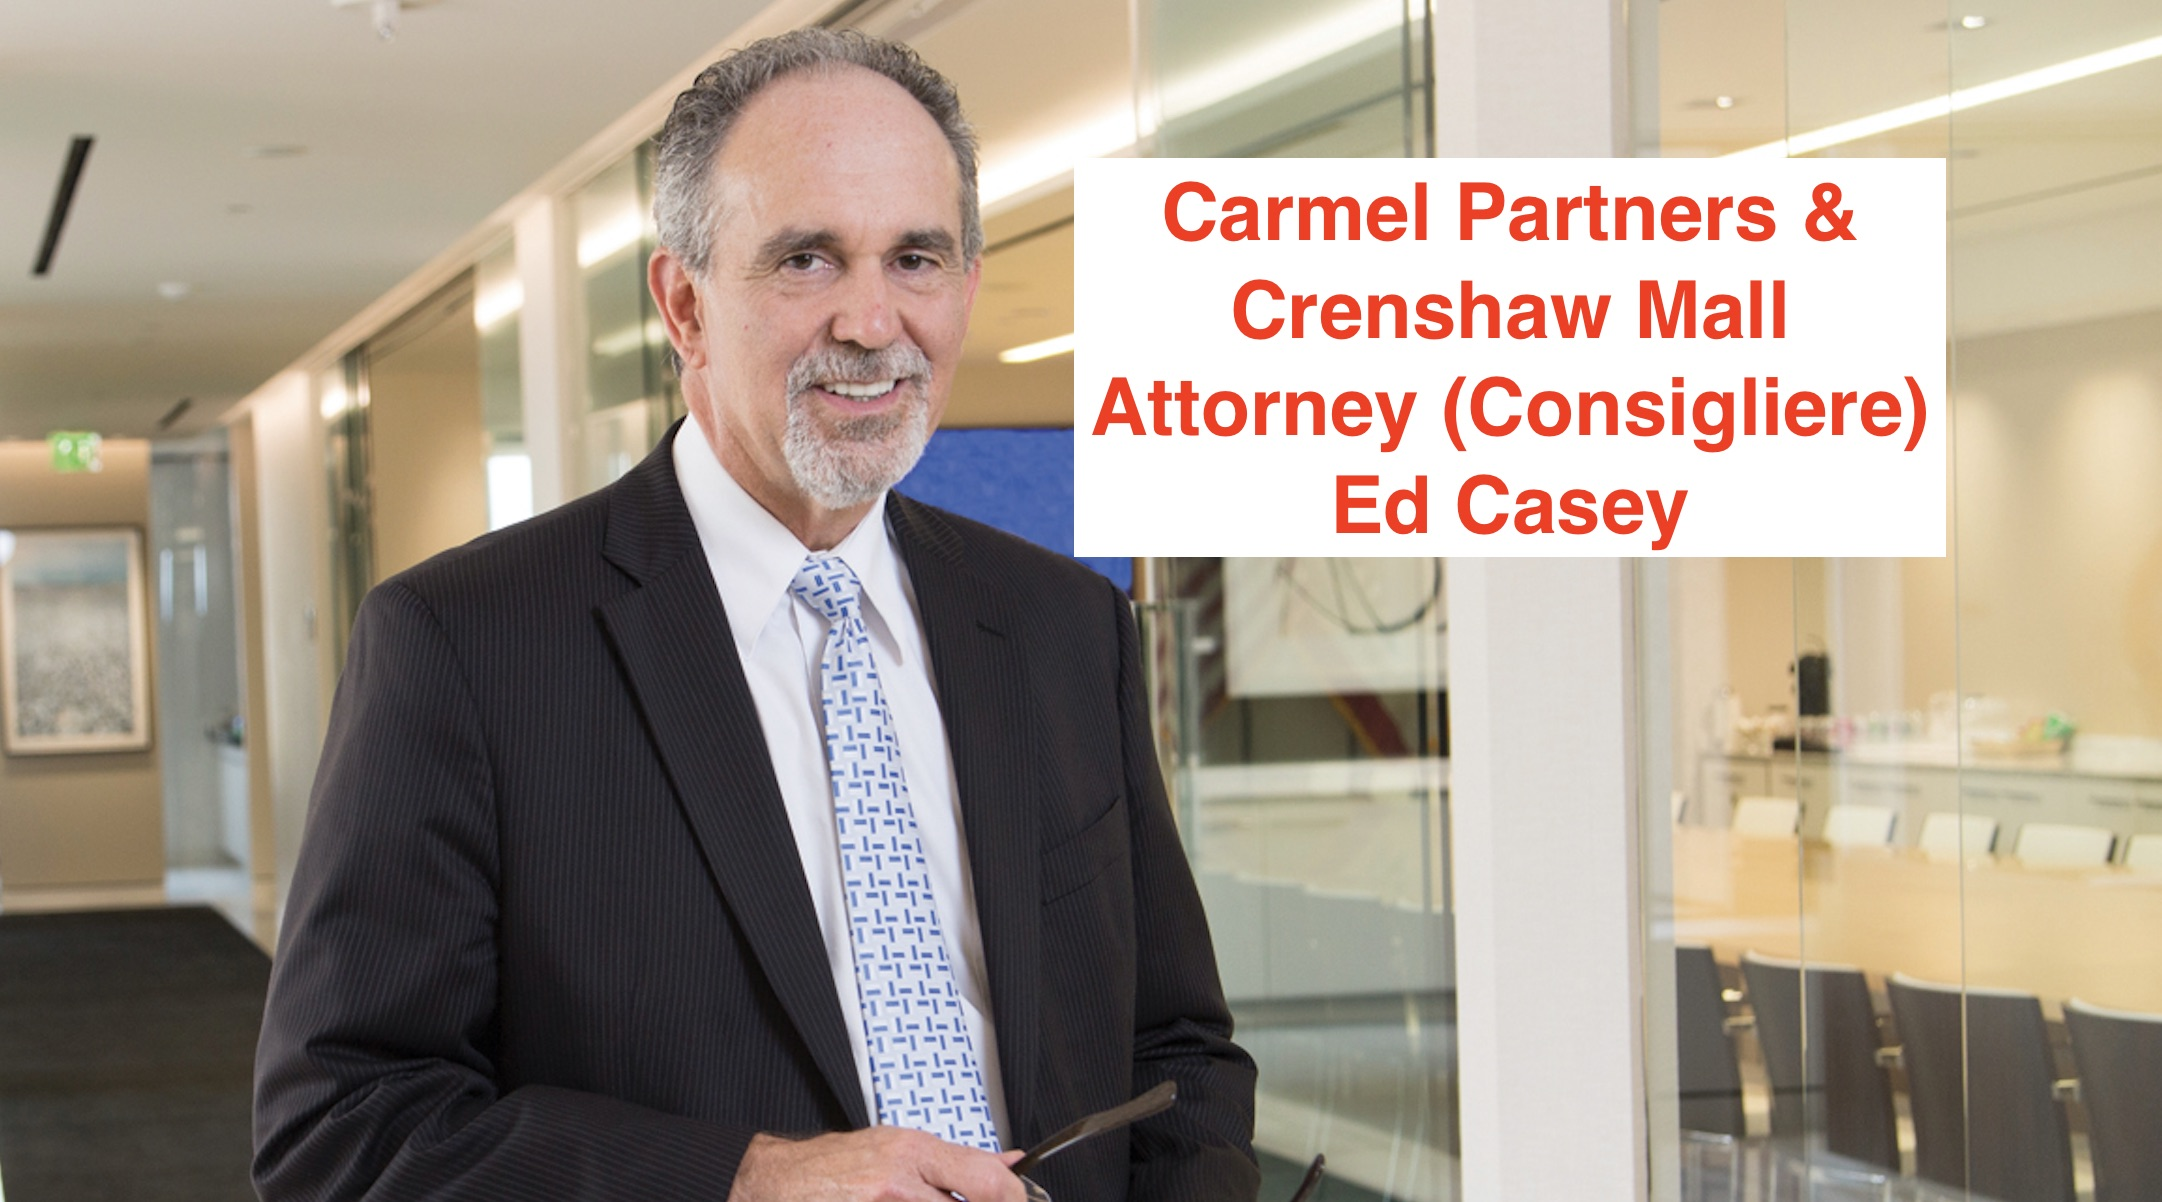 carmel-partners-ed-casey.jpg